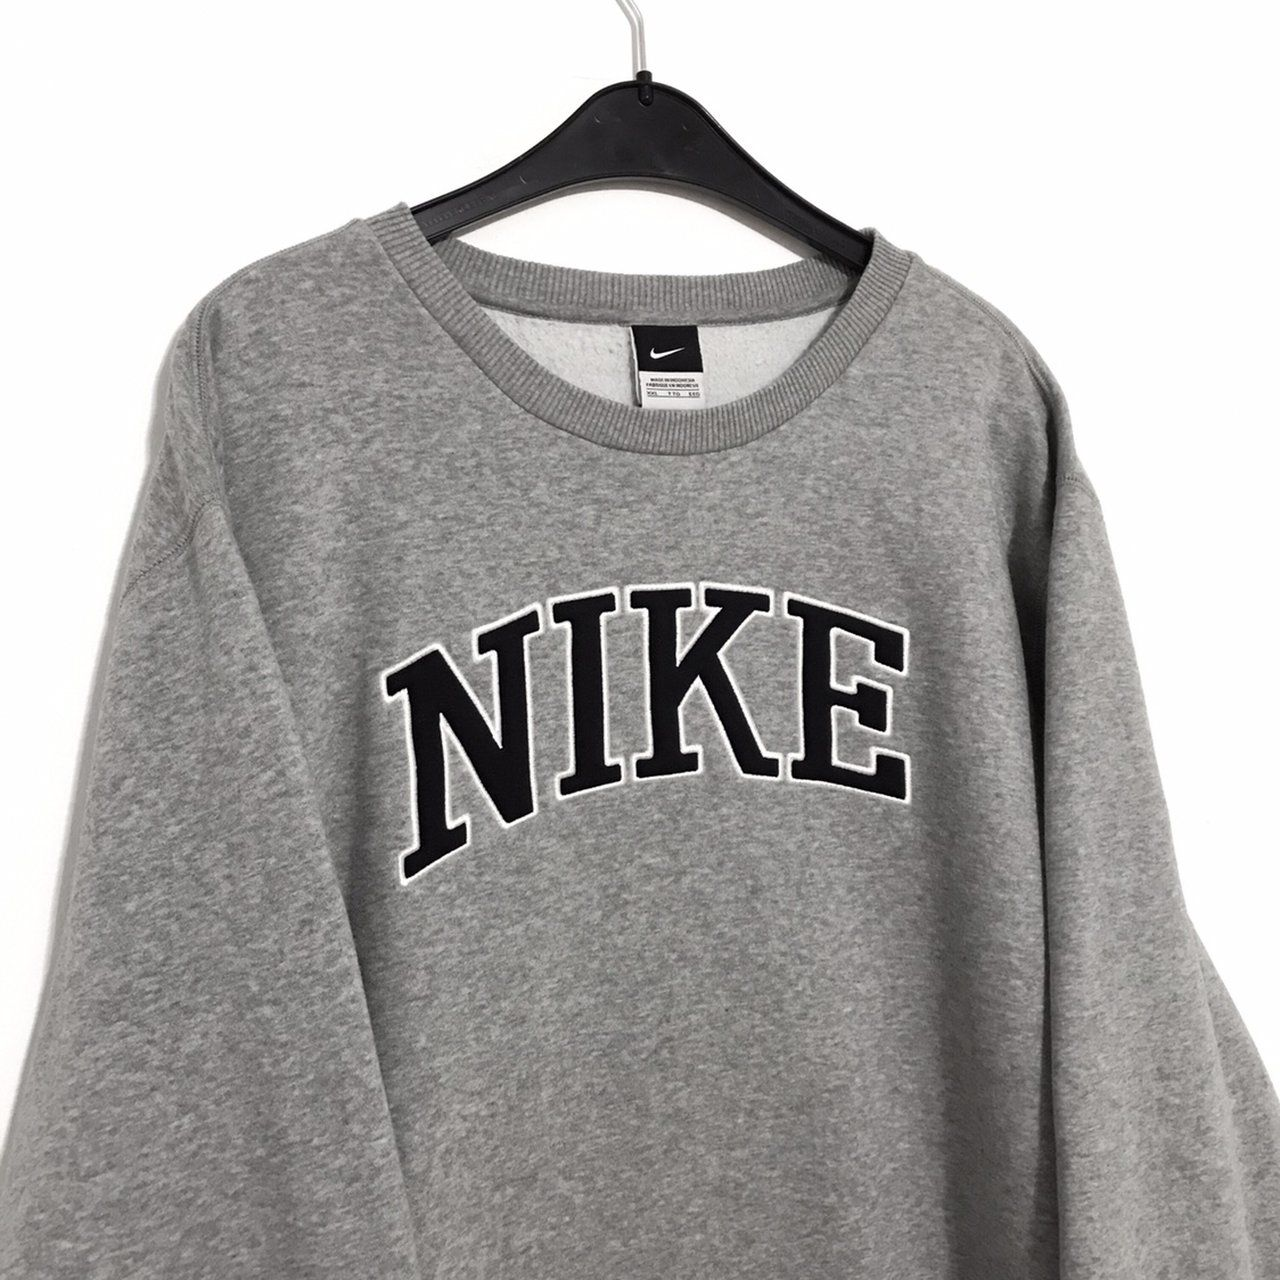 Vintage Nike Sweatshirt Size Xxl Great Condition To Pit To Depop Vintage Nike Sweatshirt Trendy Hoodies Sweatshirts [ 1280 x 1280 Pixel ]